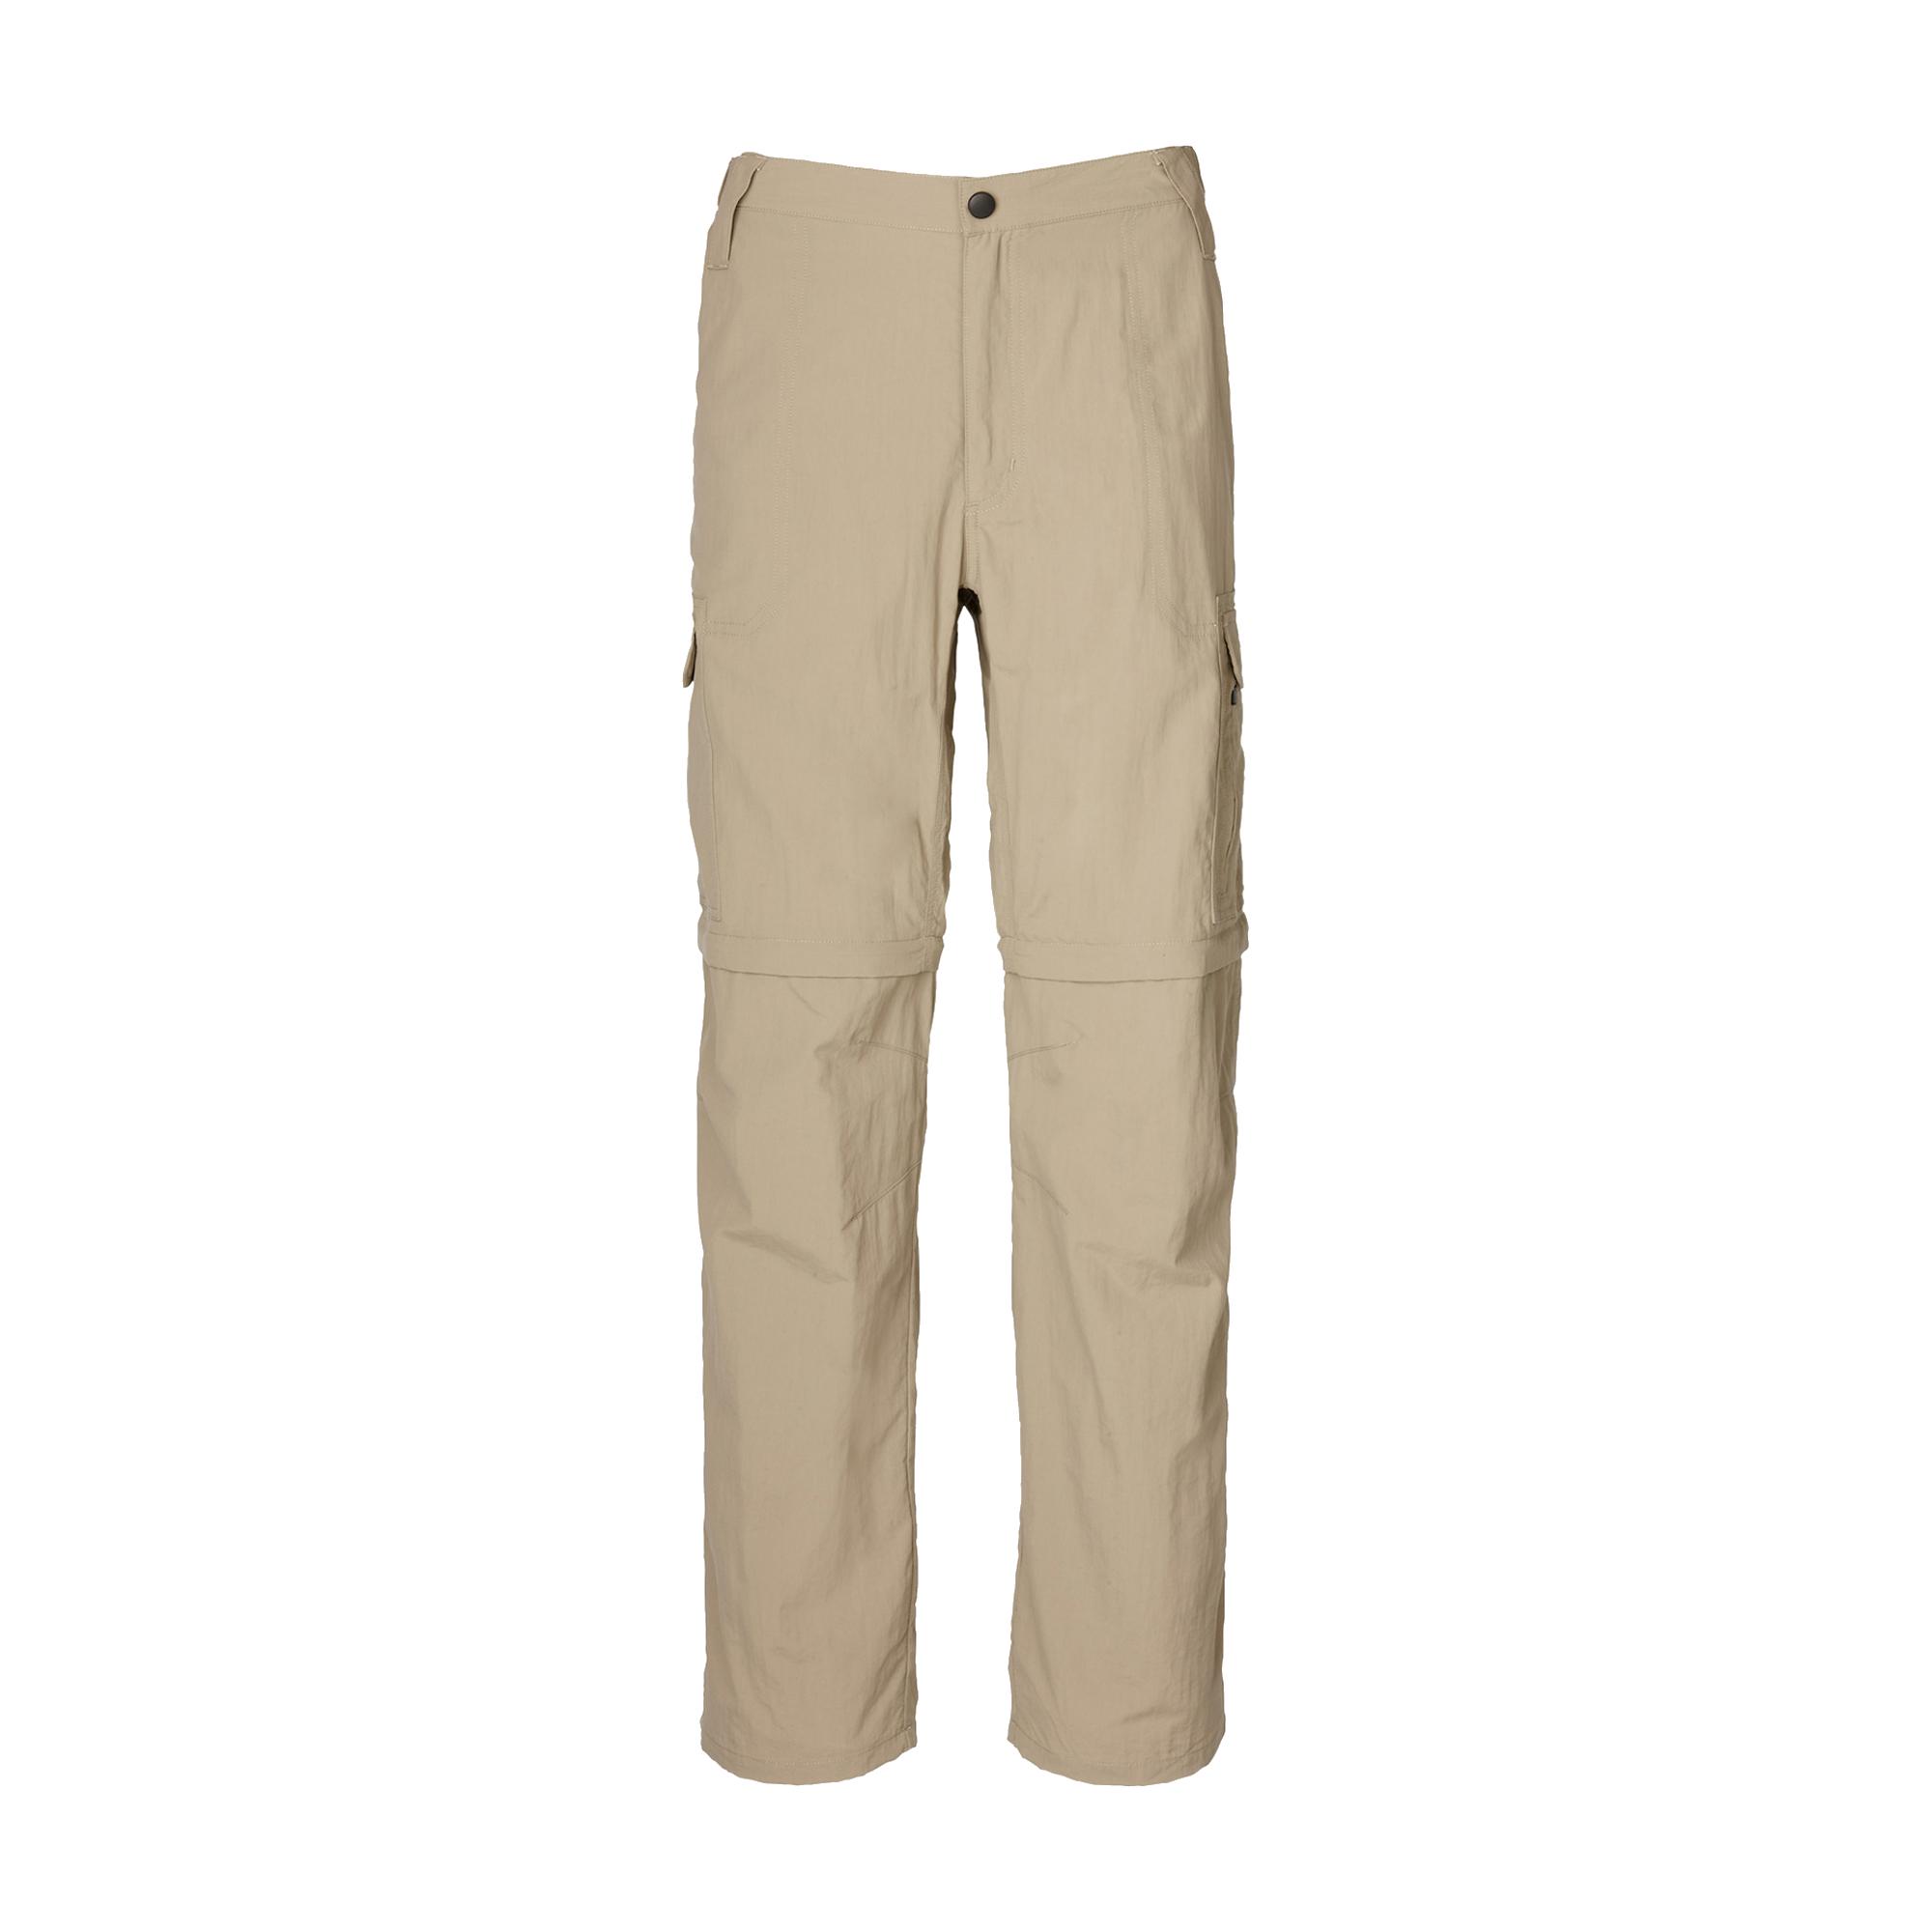 Khaki Pants Png - Mens Pant Png Clipart, Transparent background PNG HD thumbnail